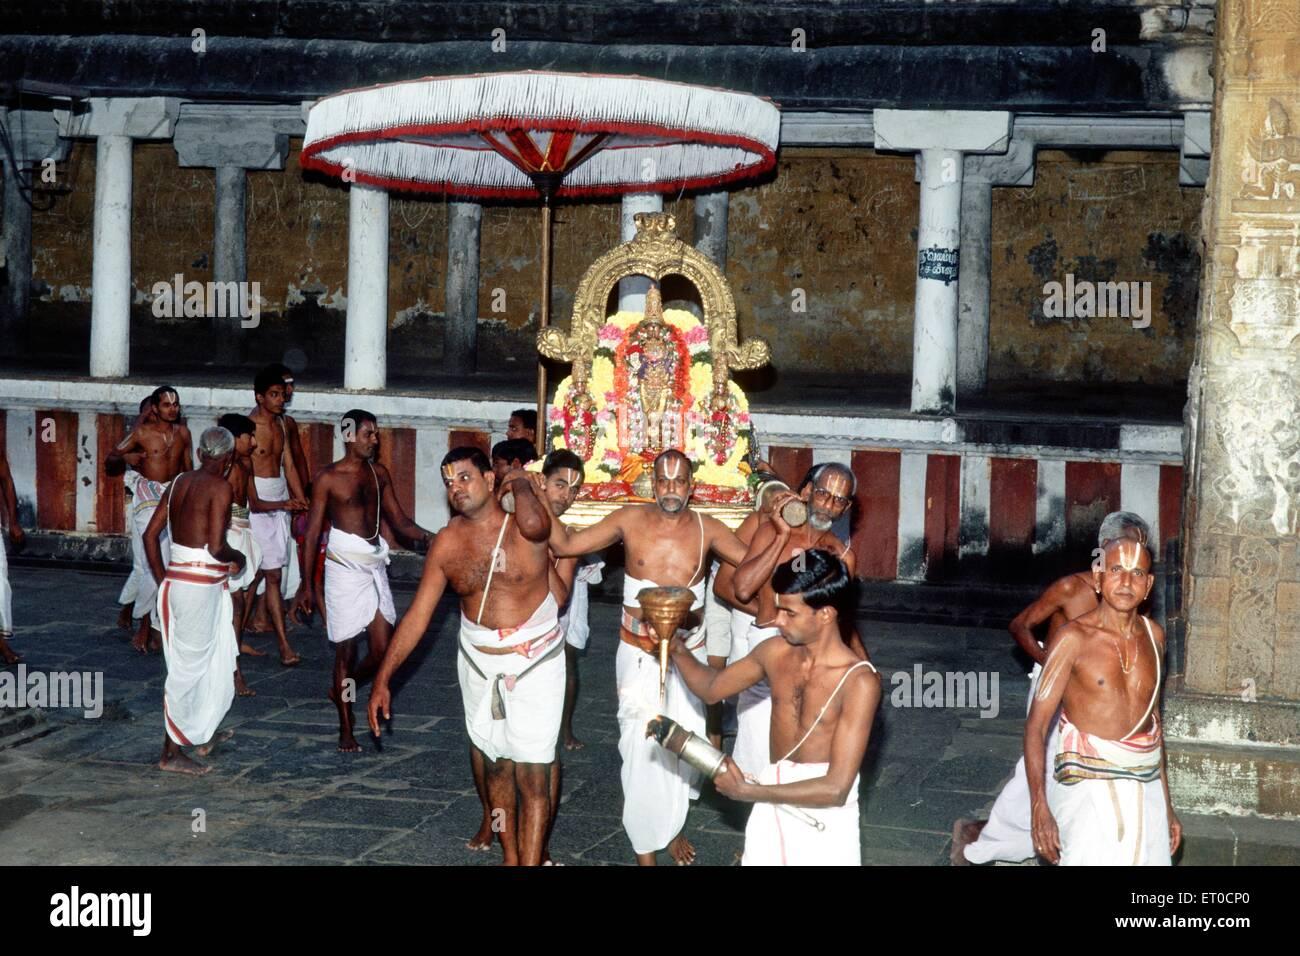 Urchave deity of Varadarajaswamy in procession in Varadarajar temple Kanchipuram Tamil Nadu India - Stock Image